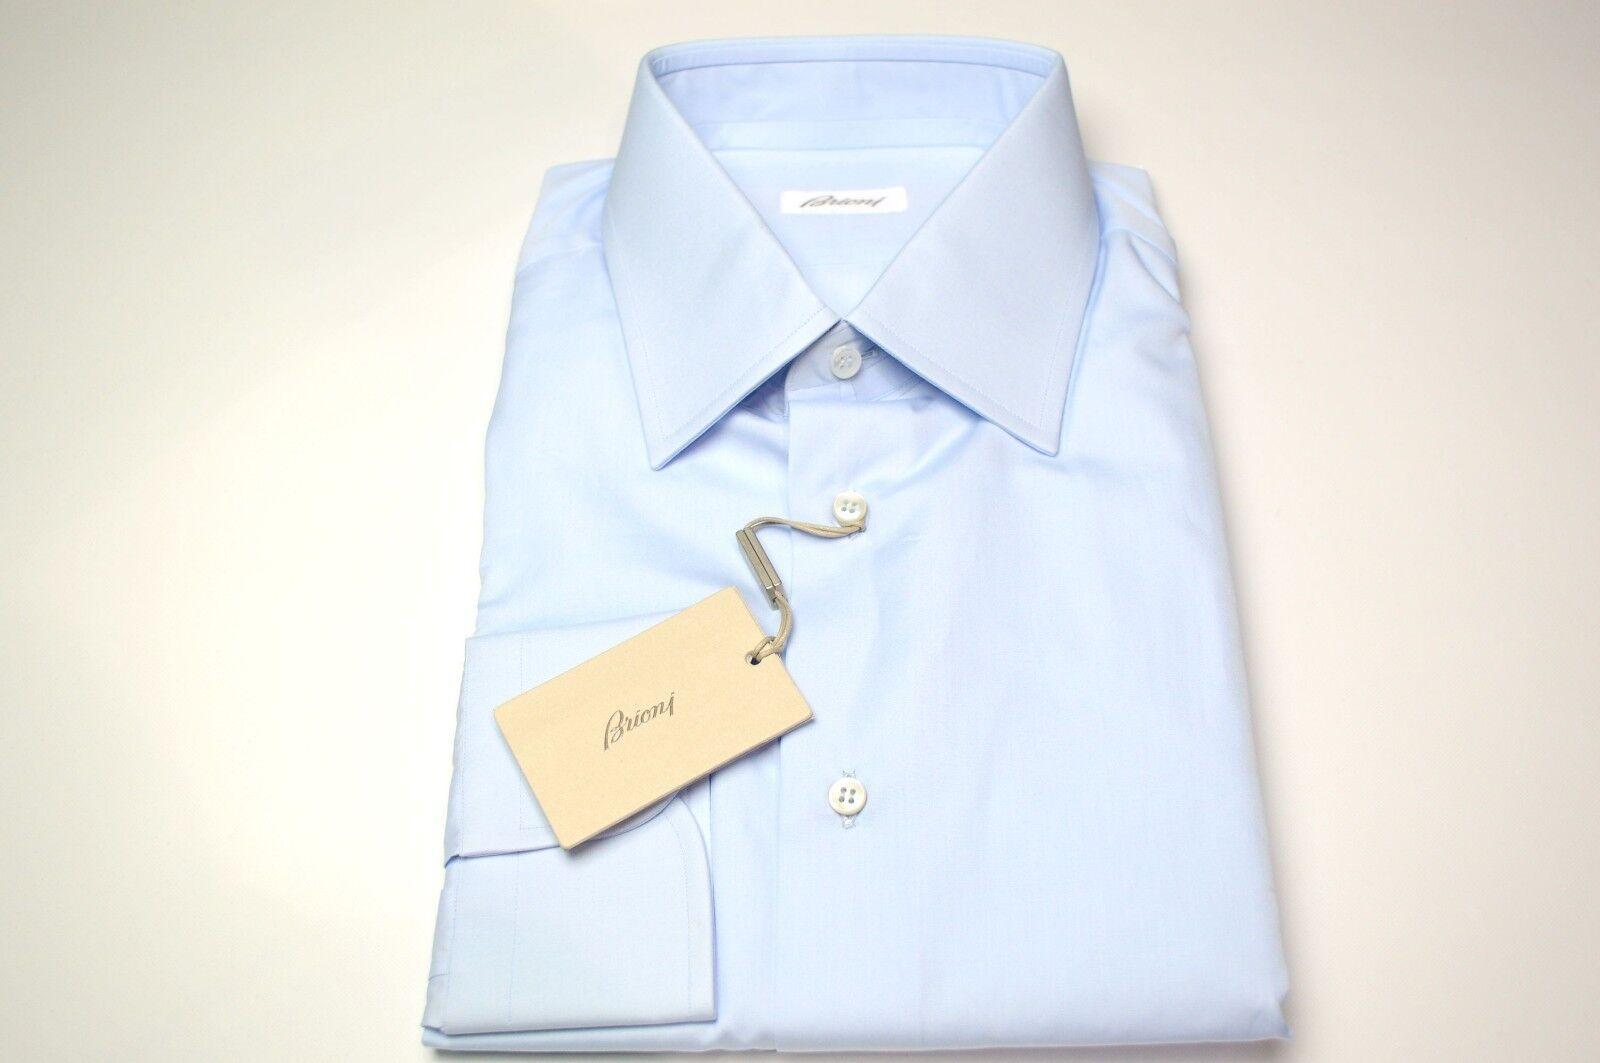 NEW  BRIONI Dress  SHIRT 100% Cotton Size 16 Us 41 Eu  (ARA110)